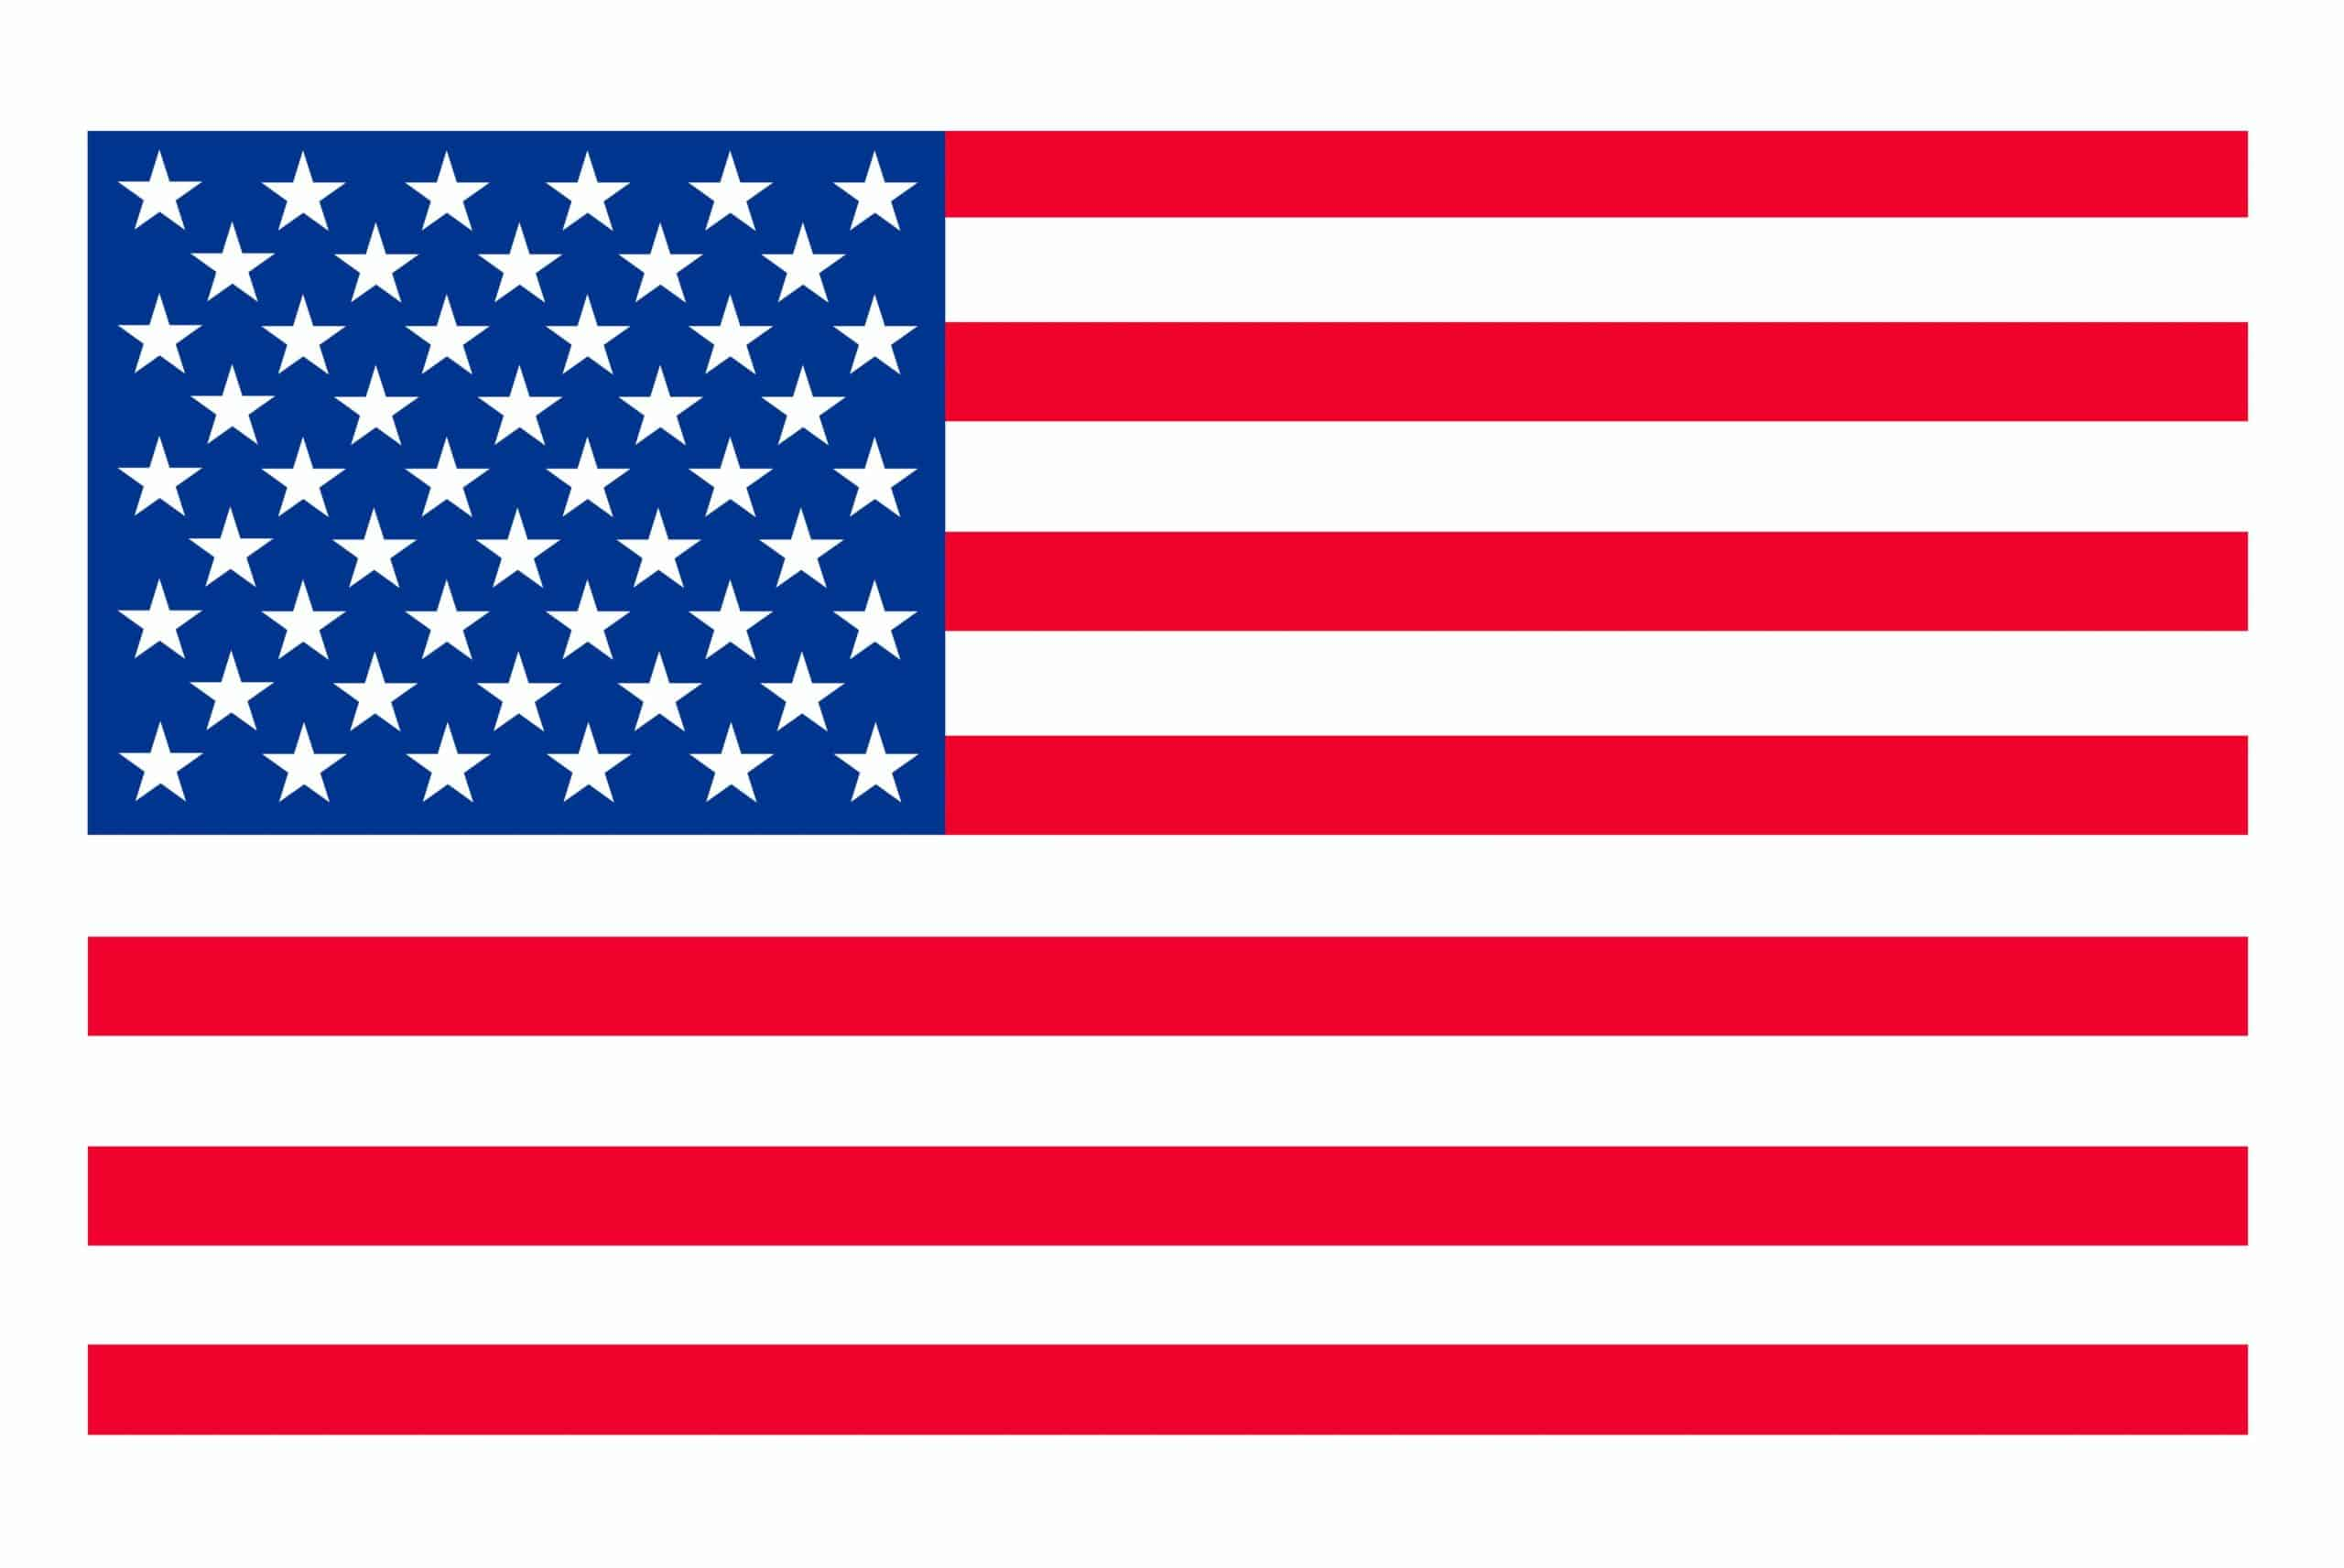 USA - Coronavirus support for freelancers